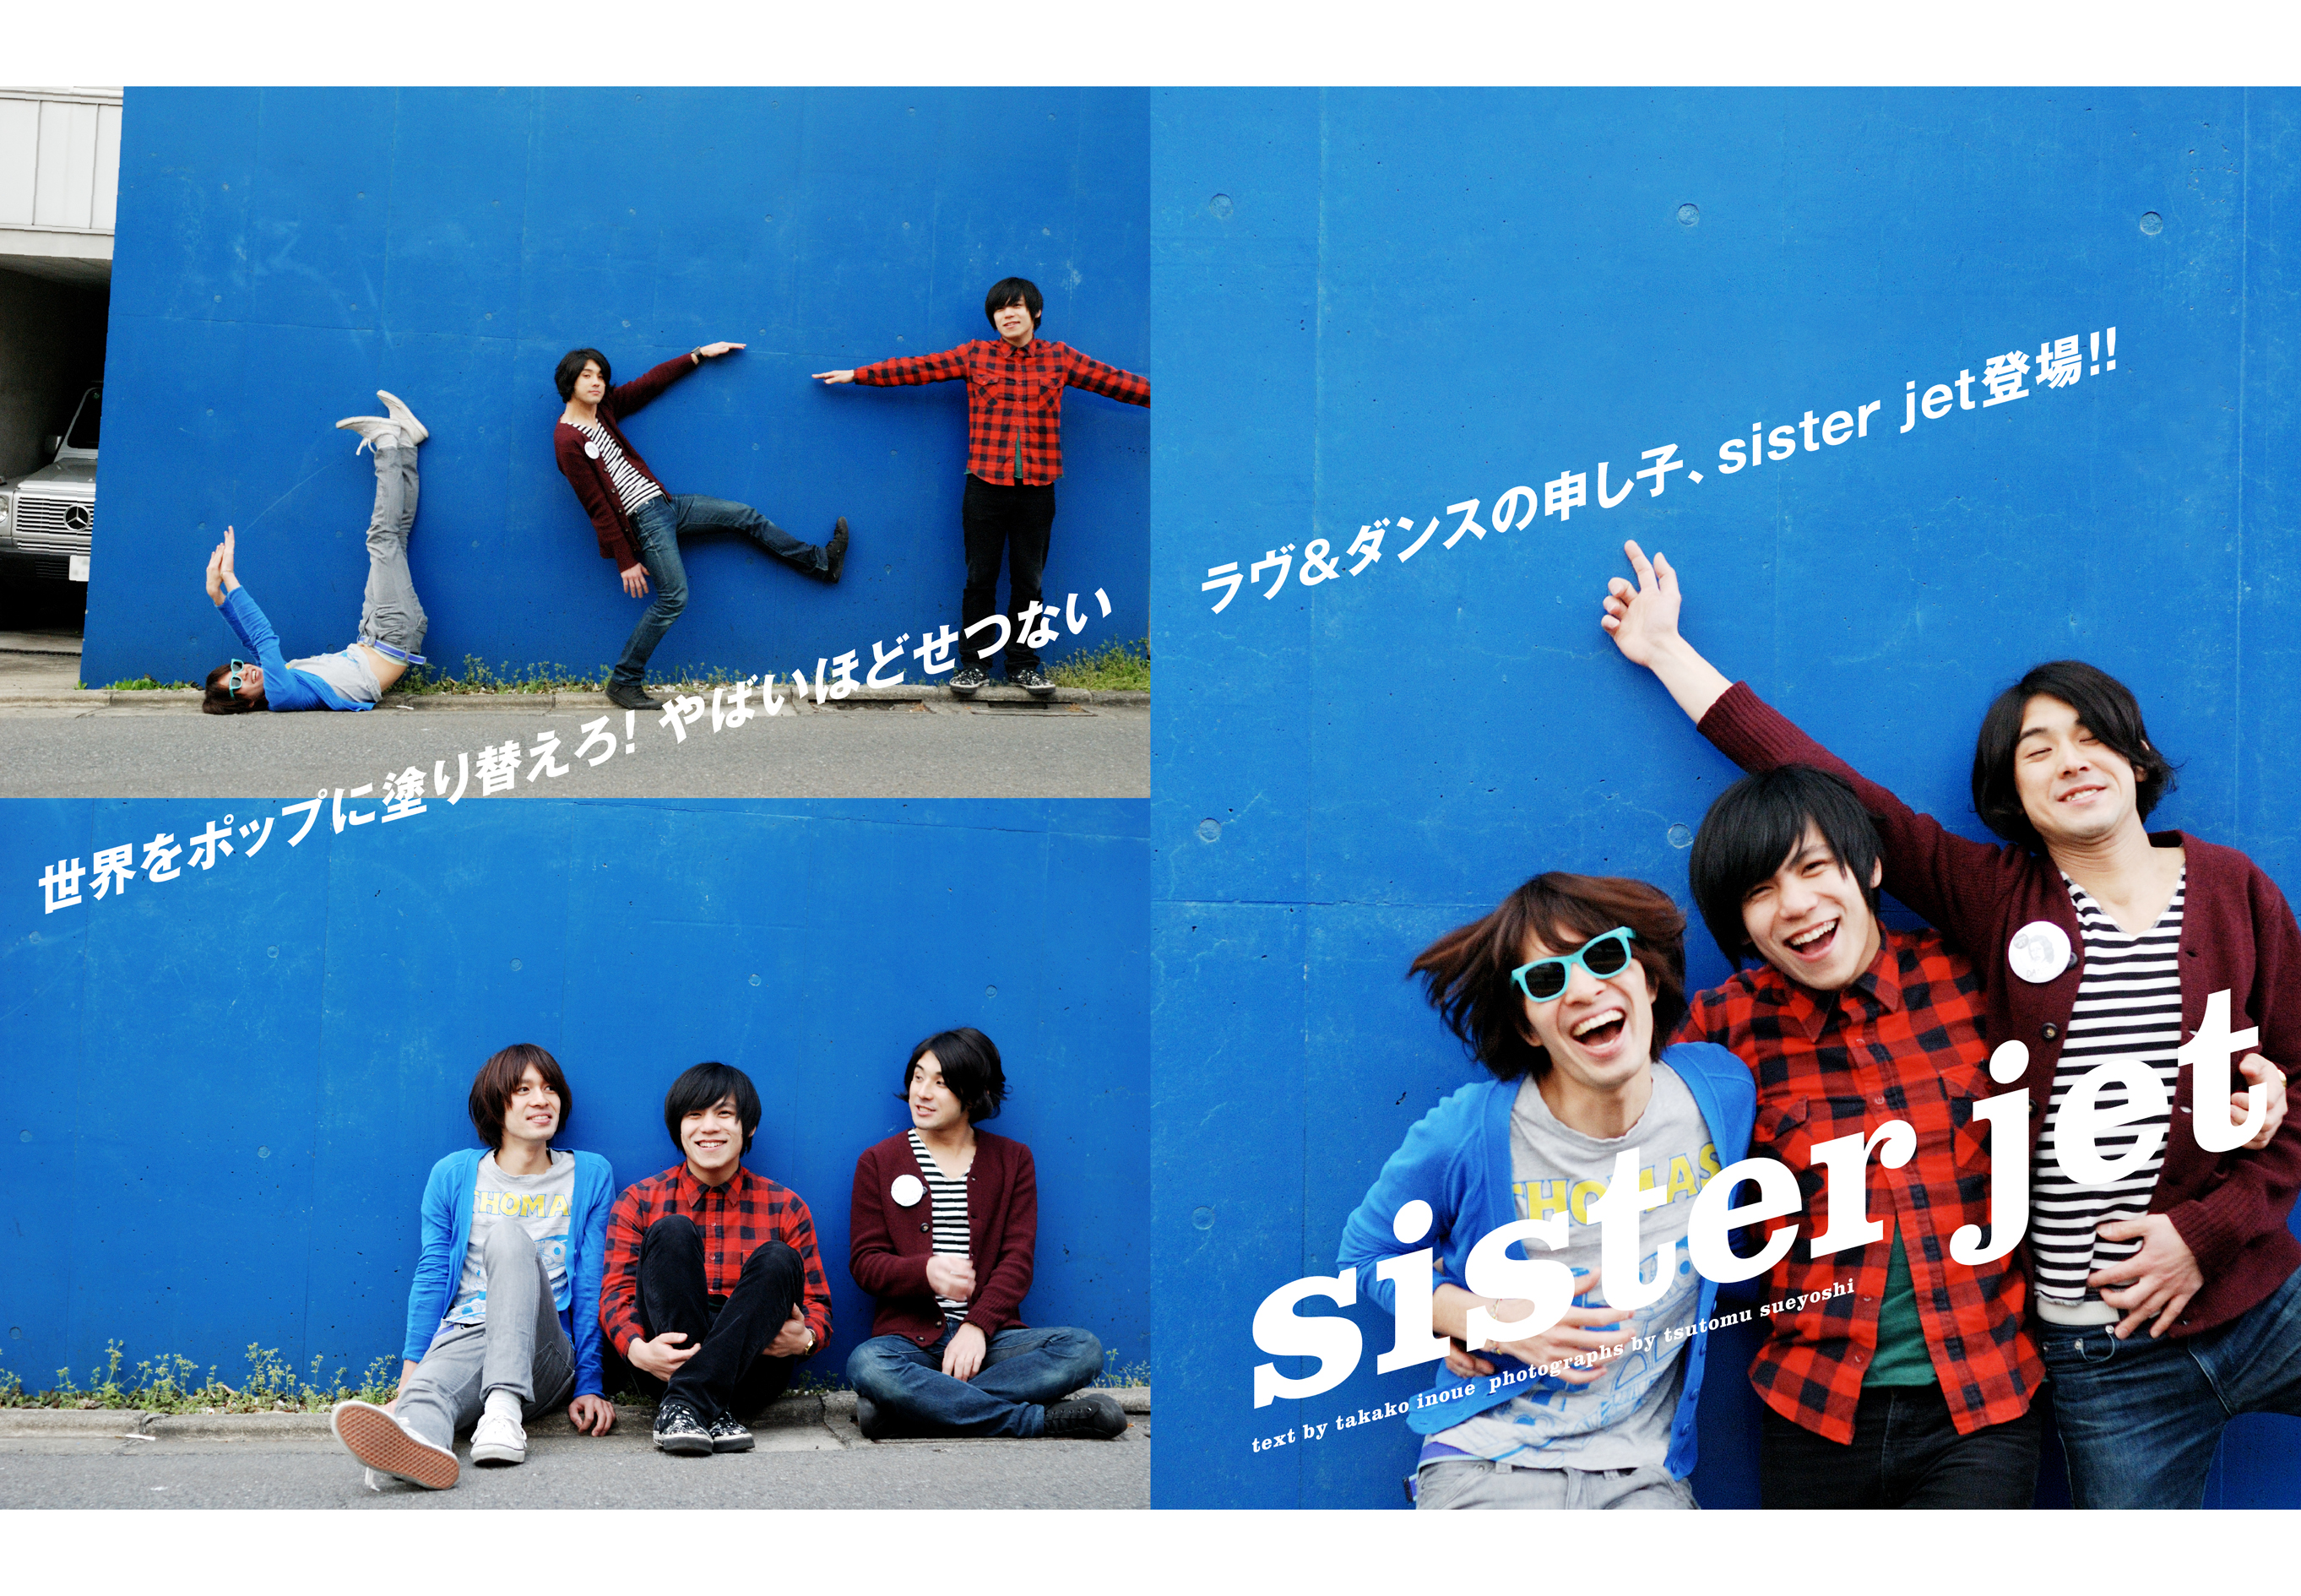 sister jet_最終入稿